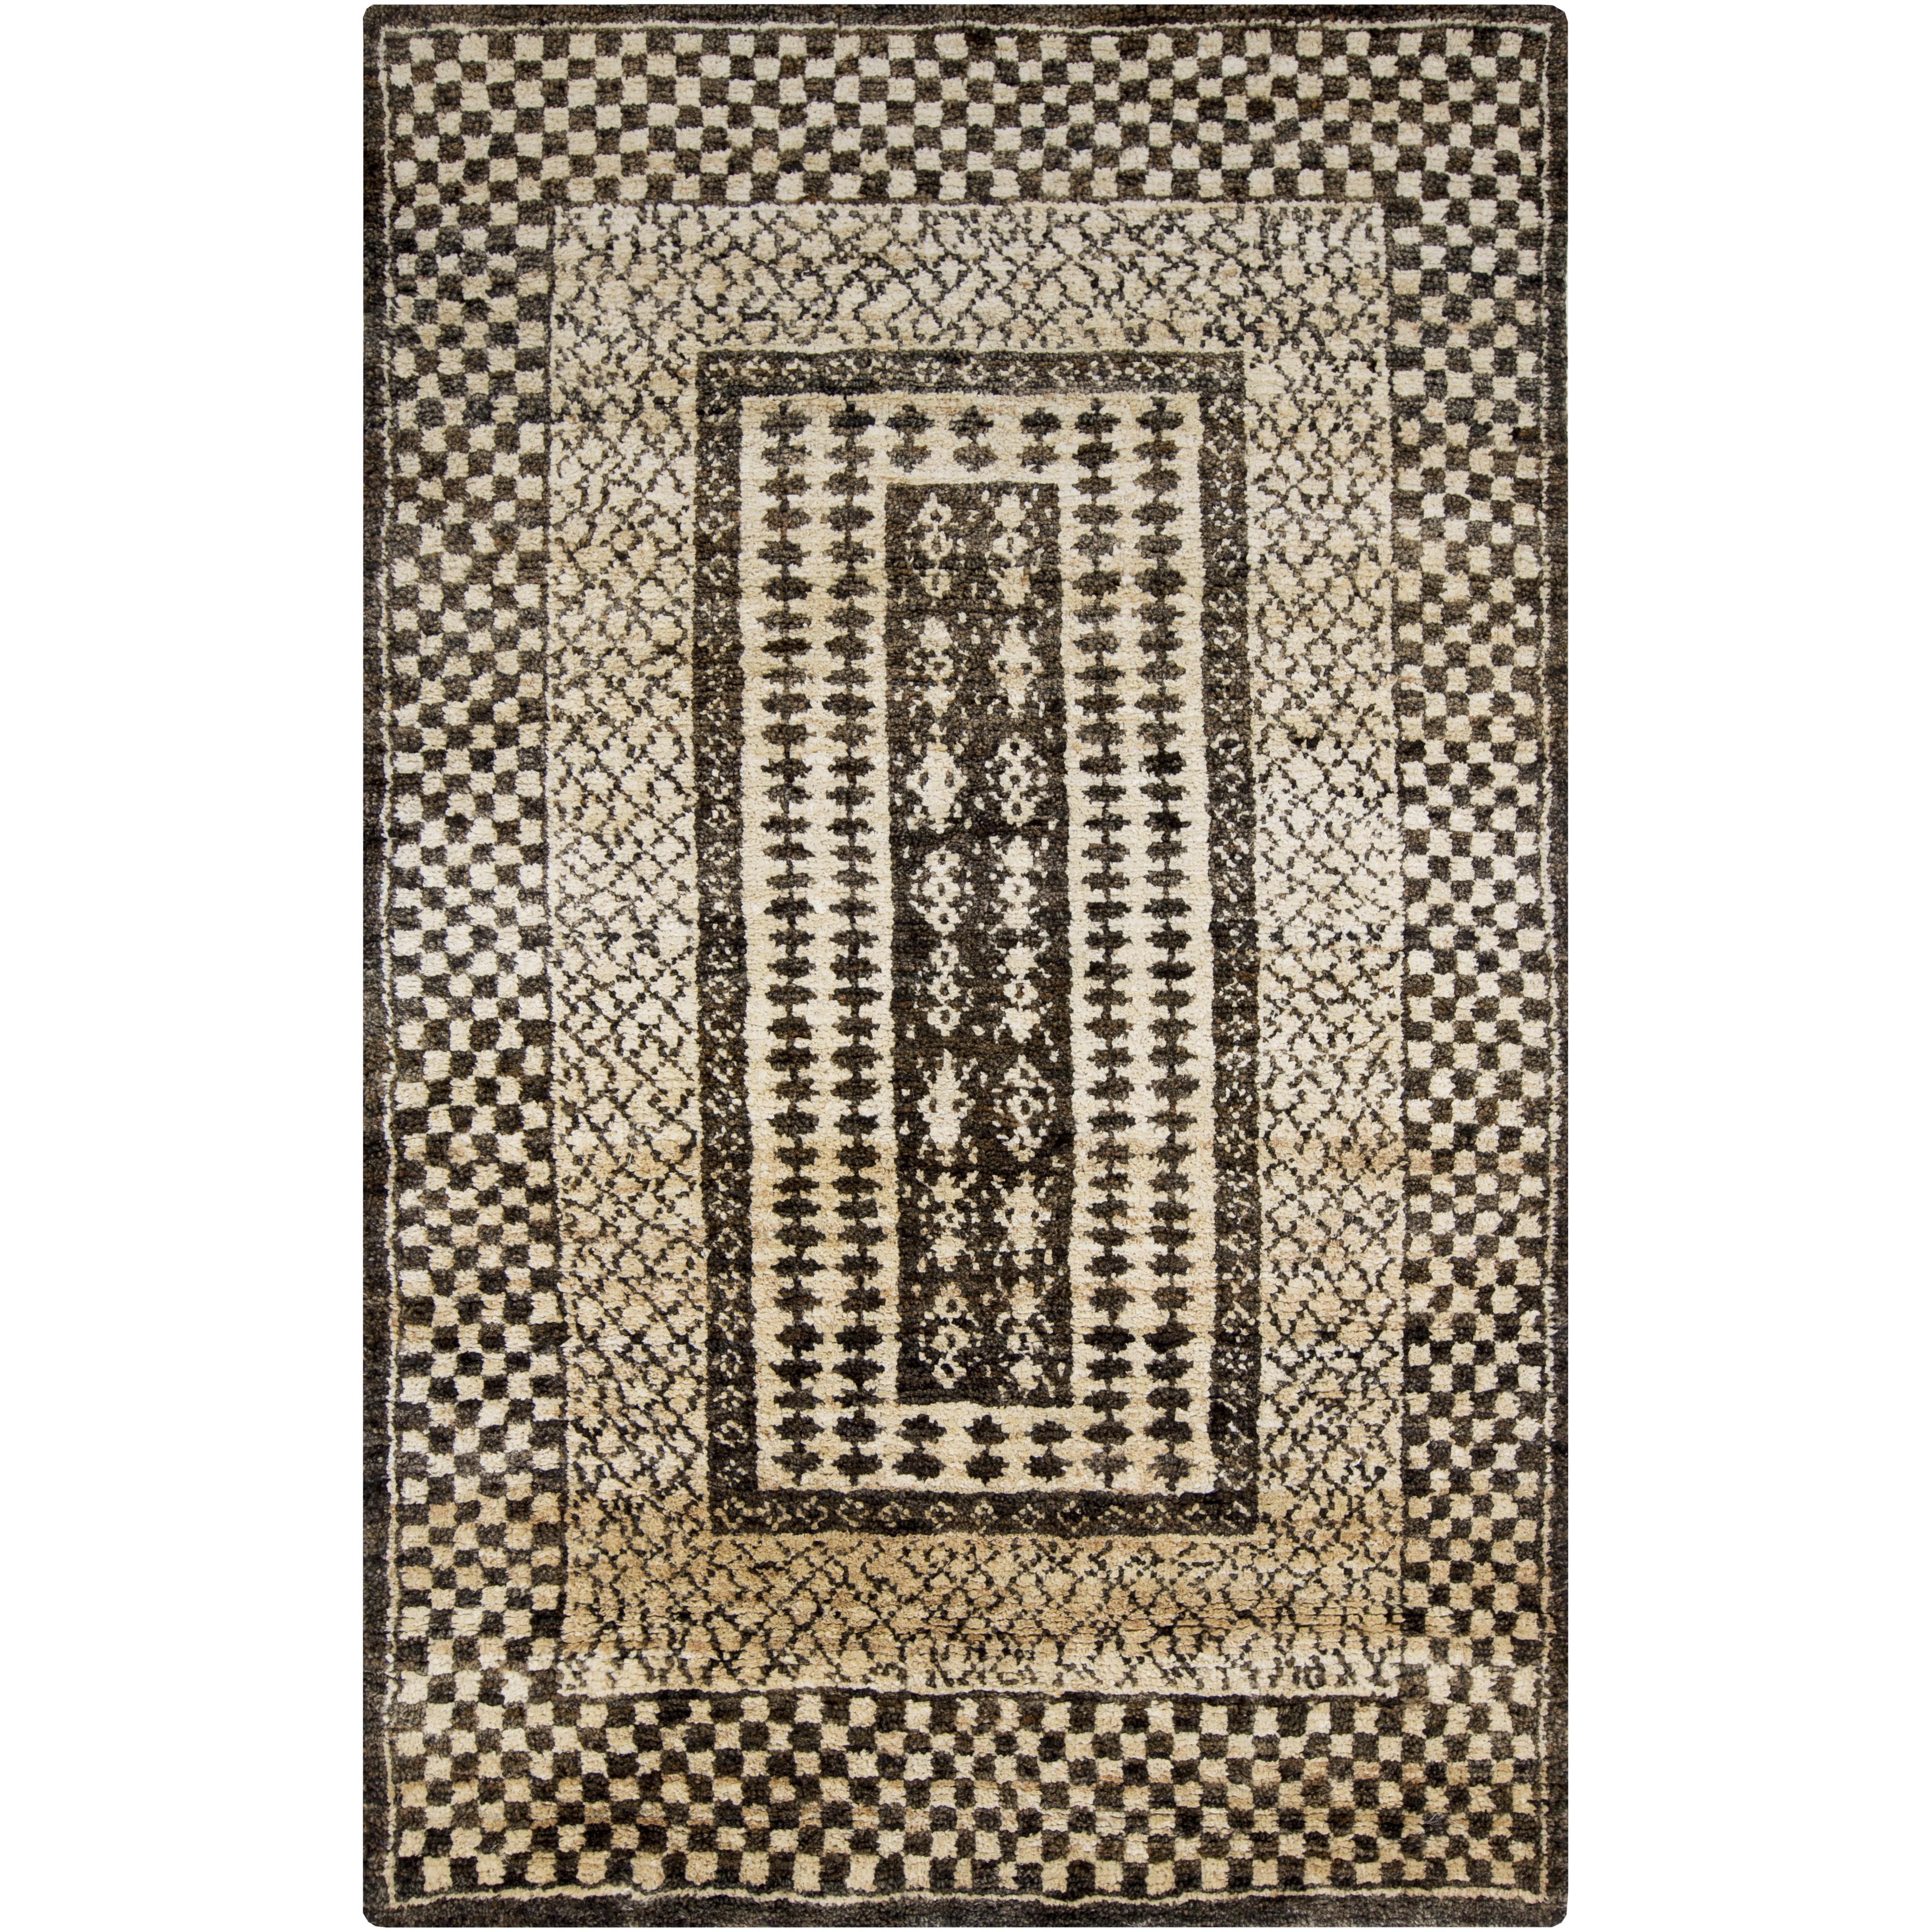 Surya Rugs Casablanca 8' x 11' - Item Number: CSB7001-811